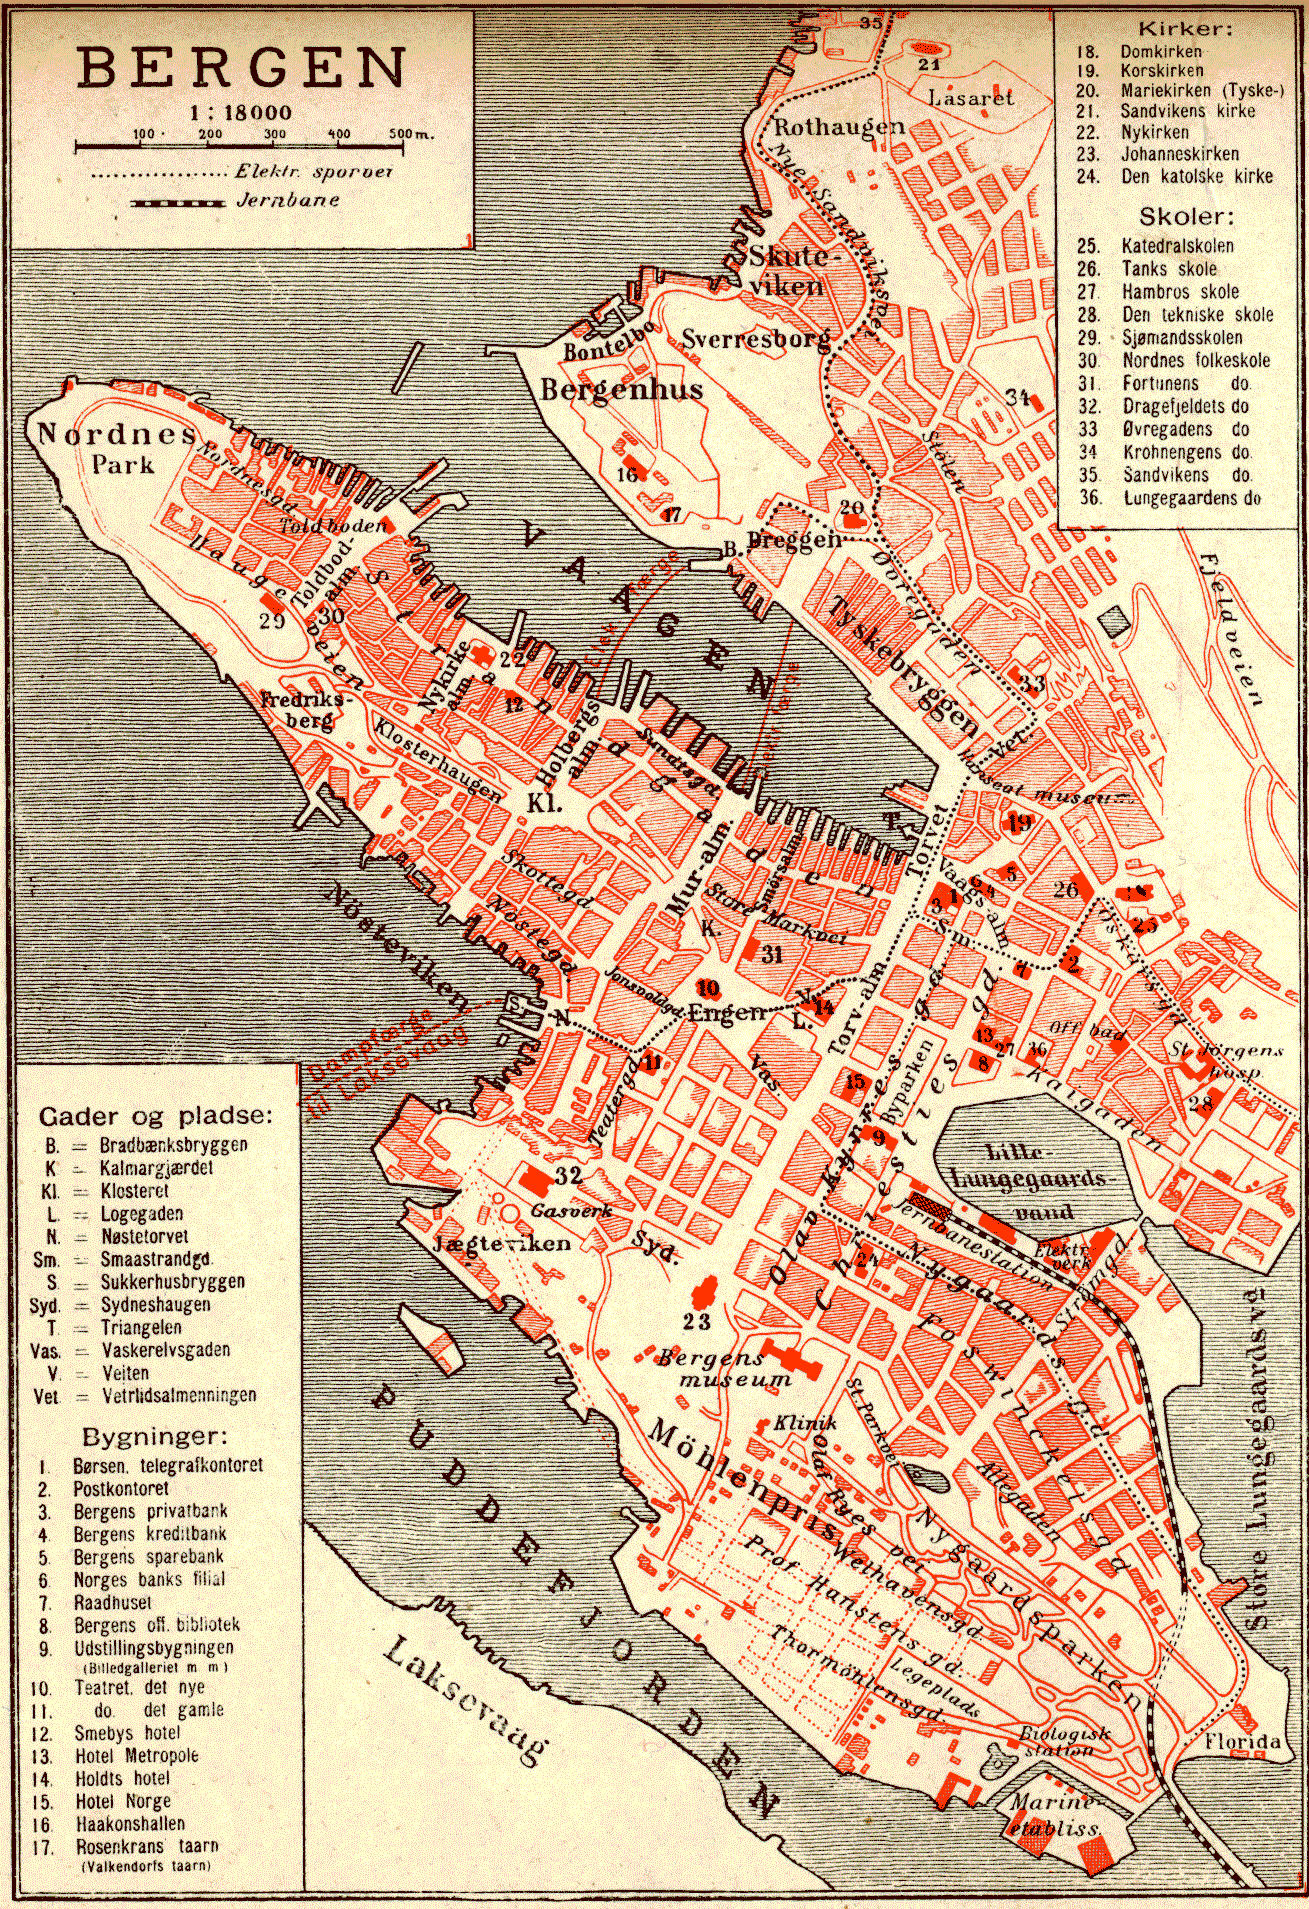 bergen trikk kart Trikken i Bergen – Wikipedia bergen trikk kart